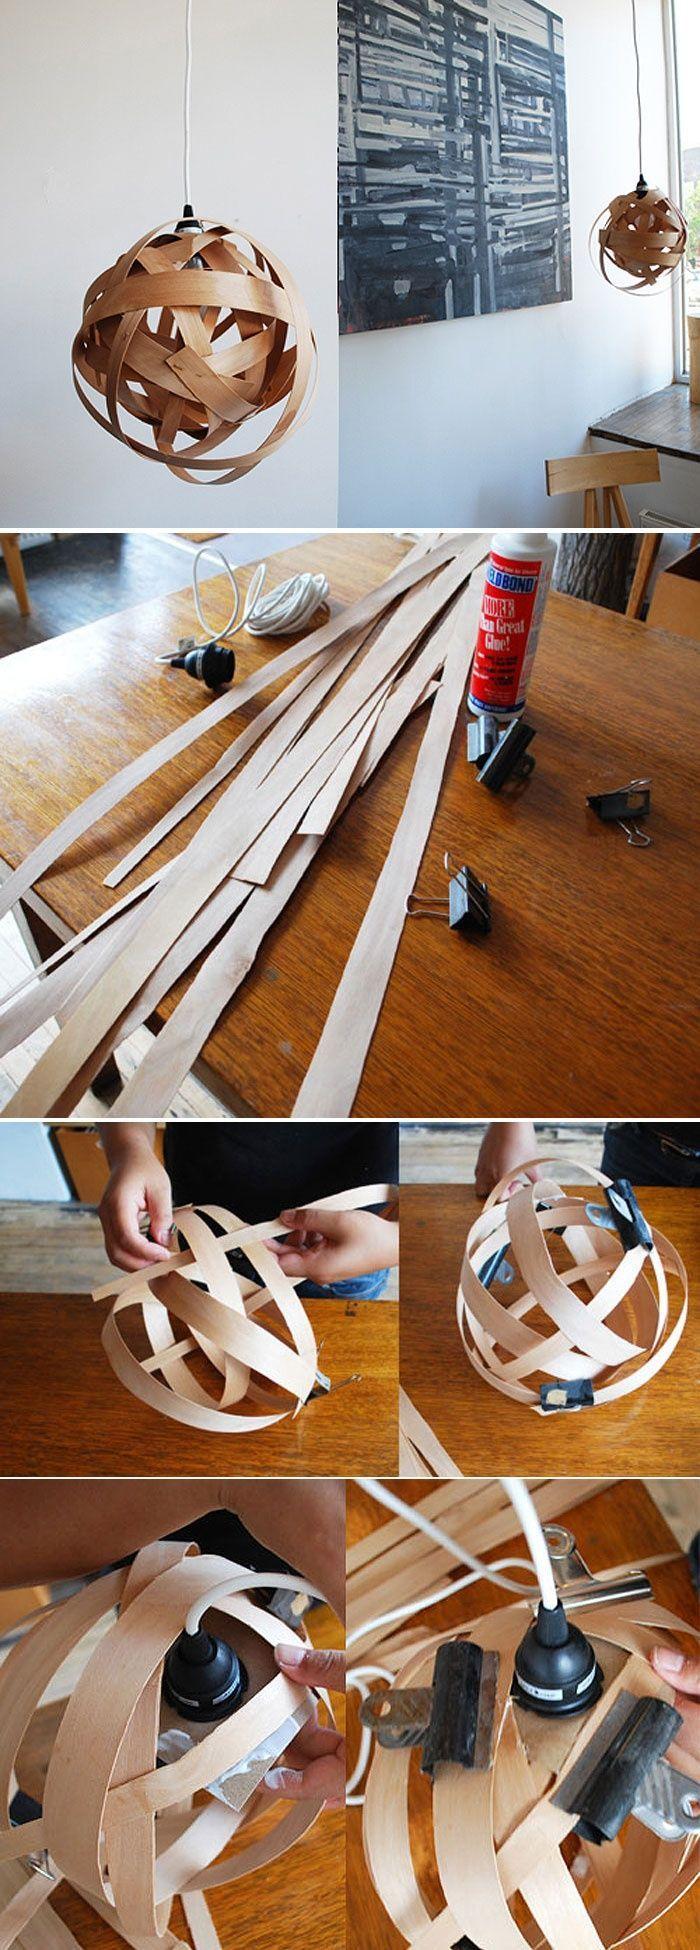 Diy make your own wood veneer pendant lighting using wood veneer diy make your own wood veneer pendant lighting using wood veneer strips some glue mozeypictures Images